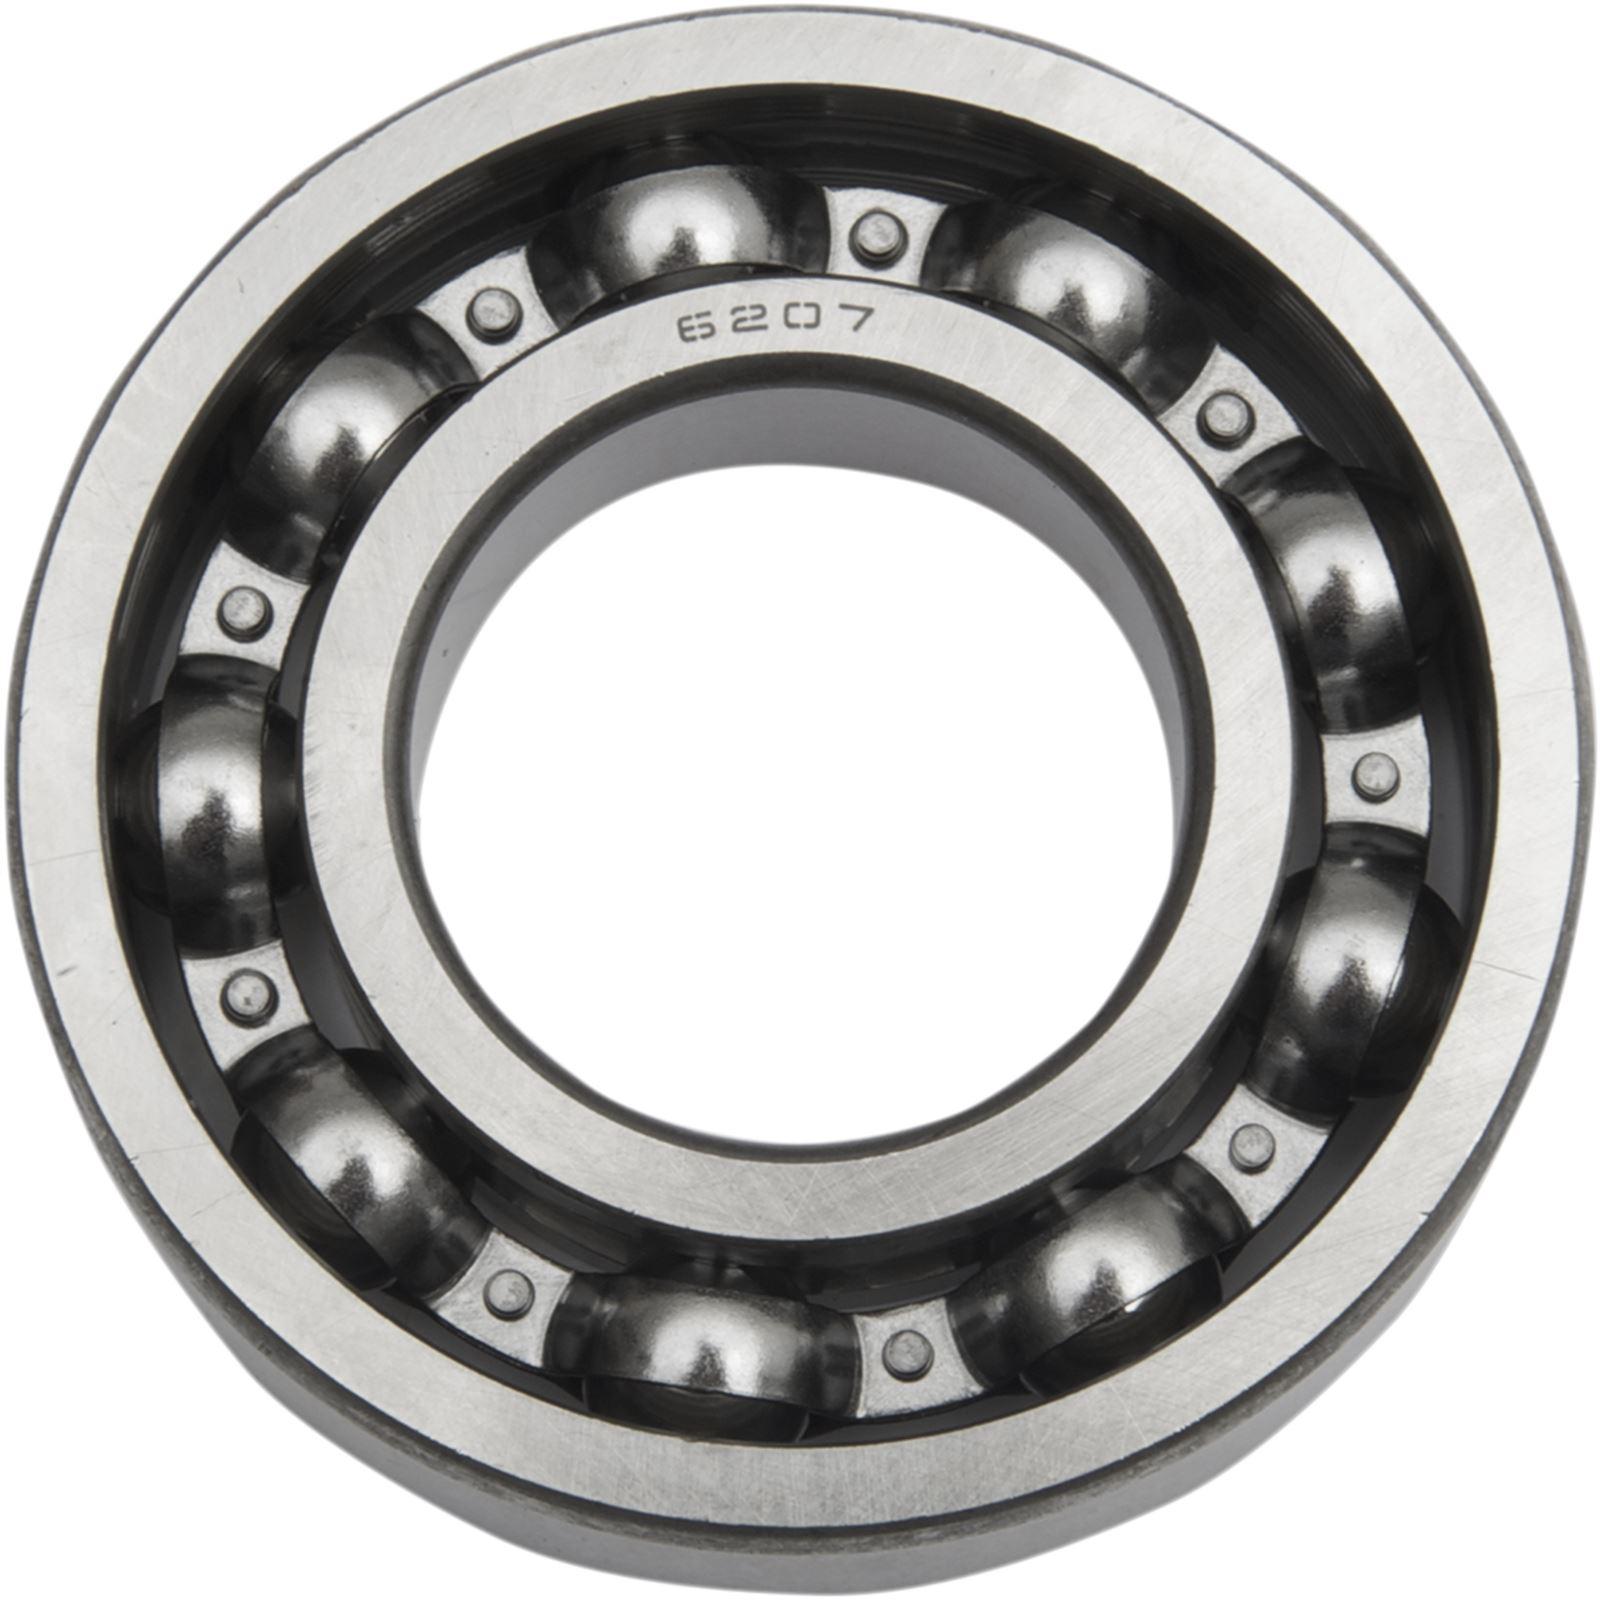 Eastern Motorcycle Parts Bearing - 36799-91